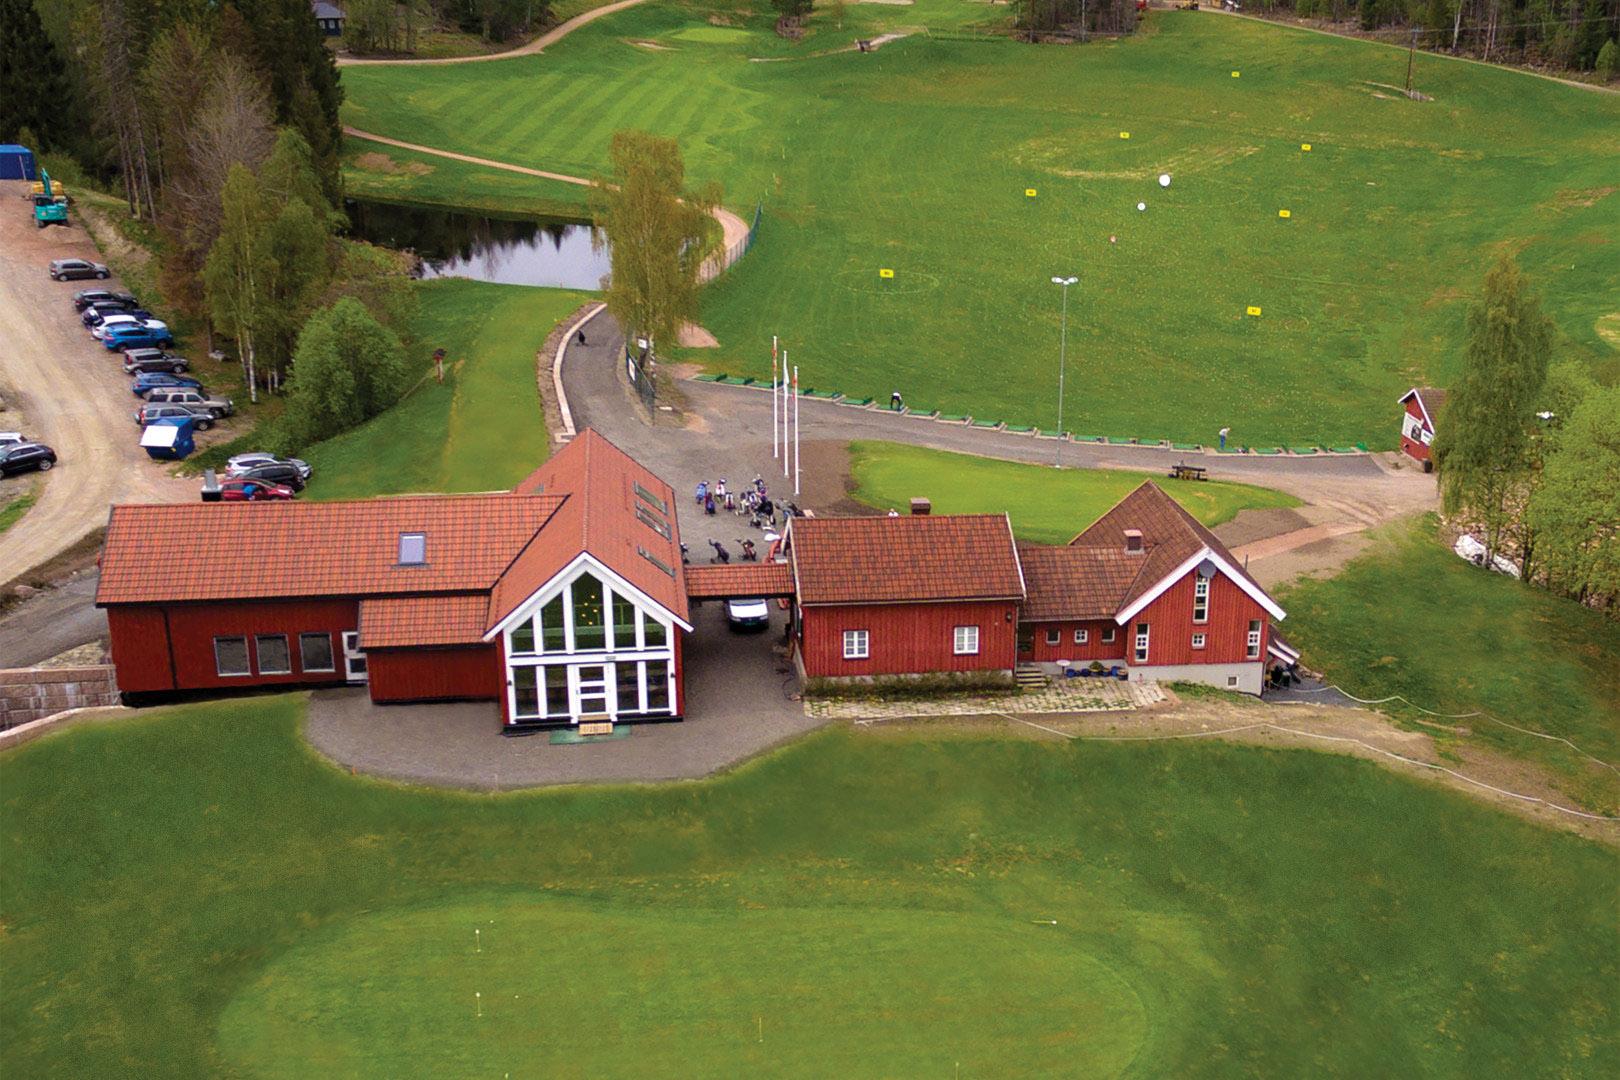 Kjekstad Golfklubb 3_bilde-scorekort-2019